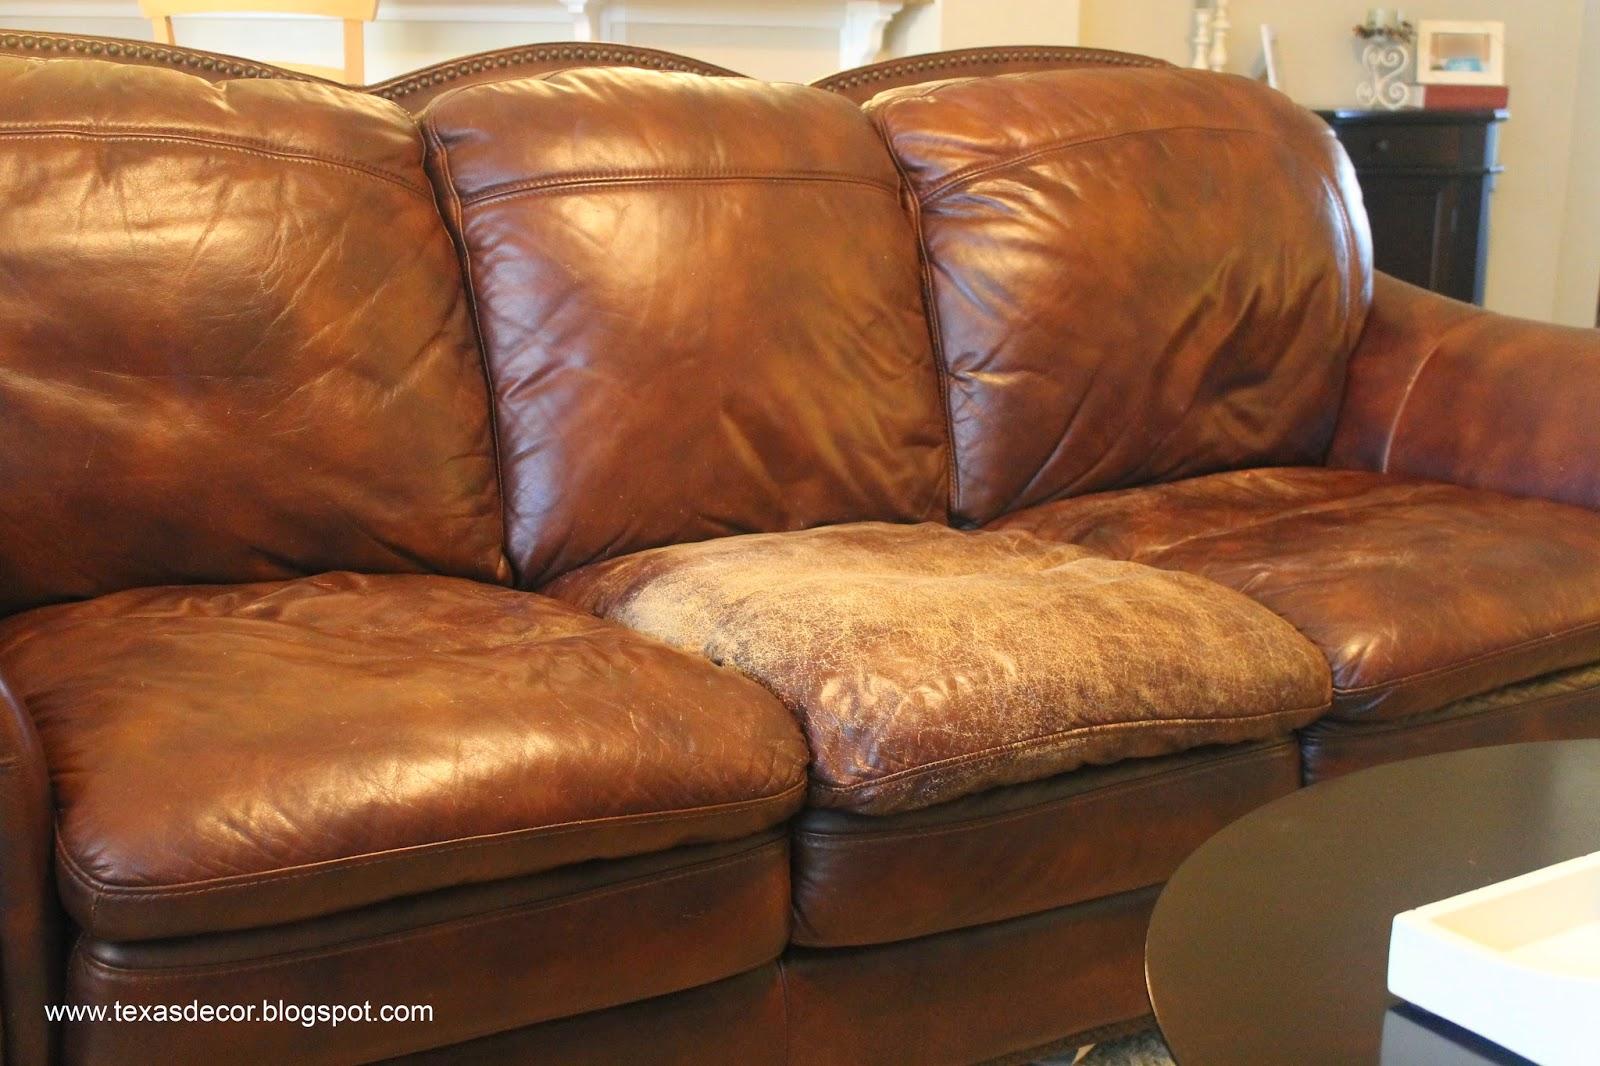 Texas Decor New Living Room Furniture